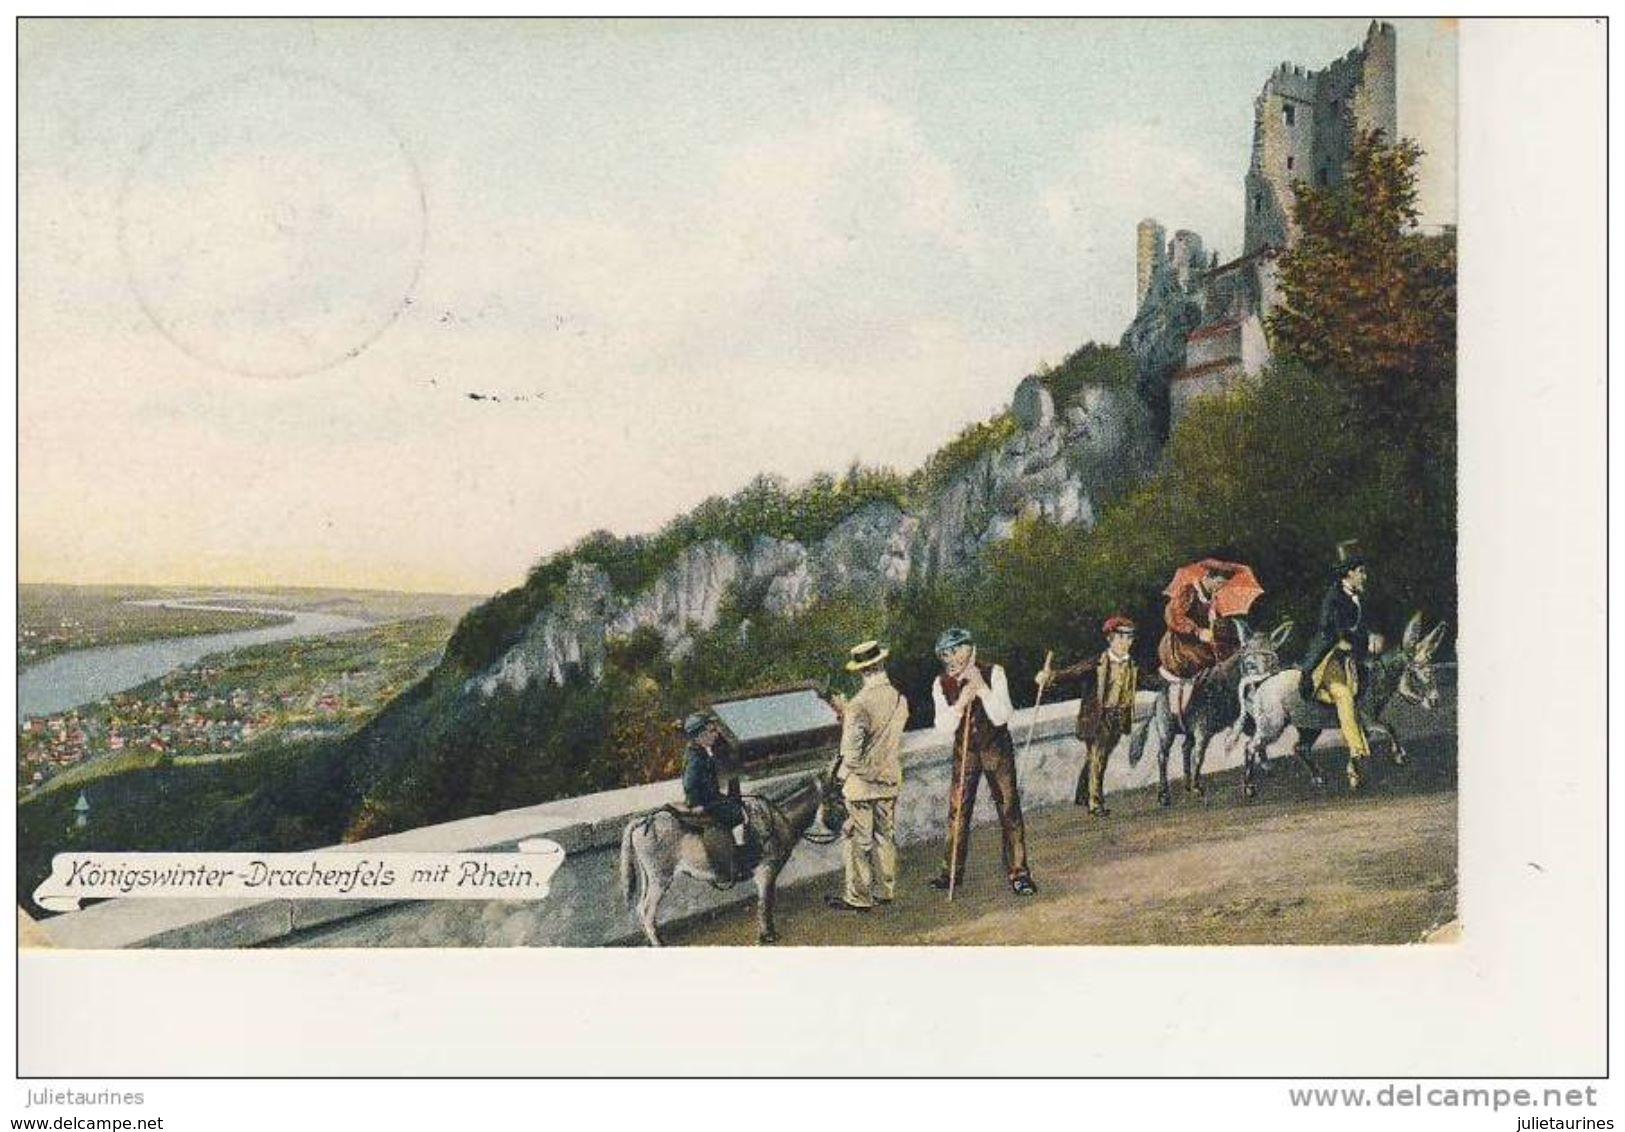 Konigswinter Drachenfels Mit Rhein PROMENADE A DOS D'ANES - Koenigswinter